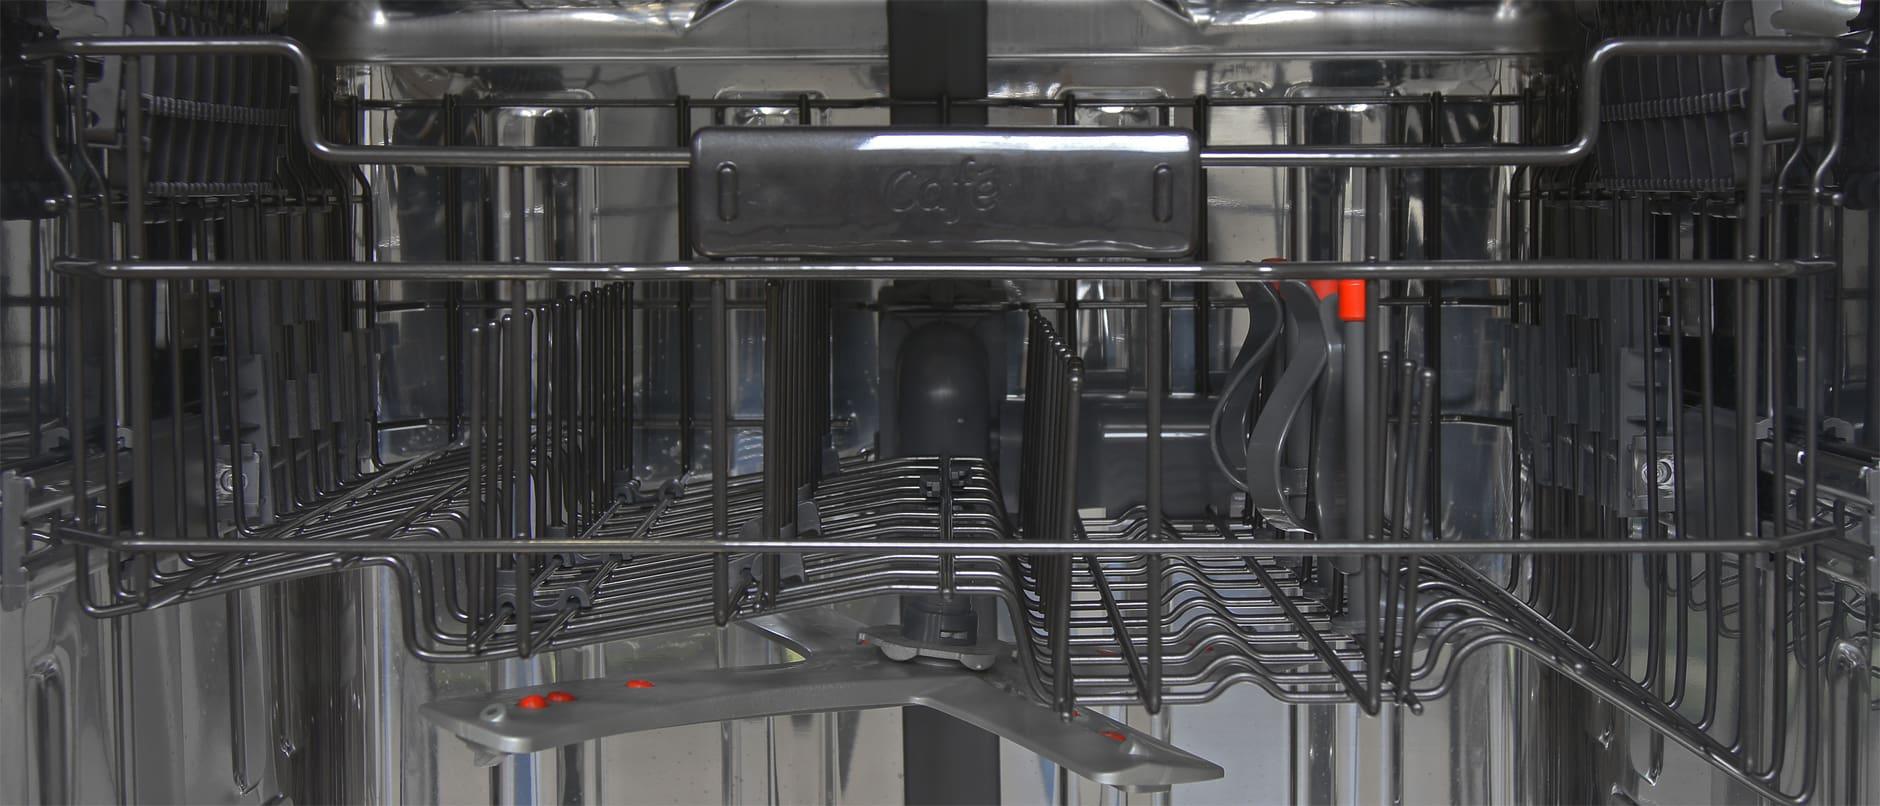 GE Cafe CDT725SSFSS close up of top rack